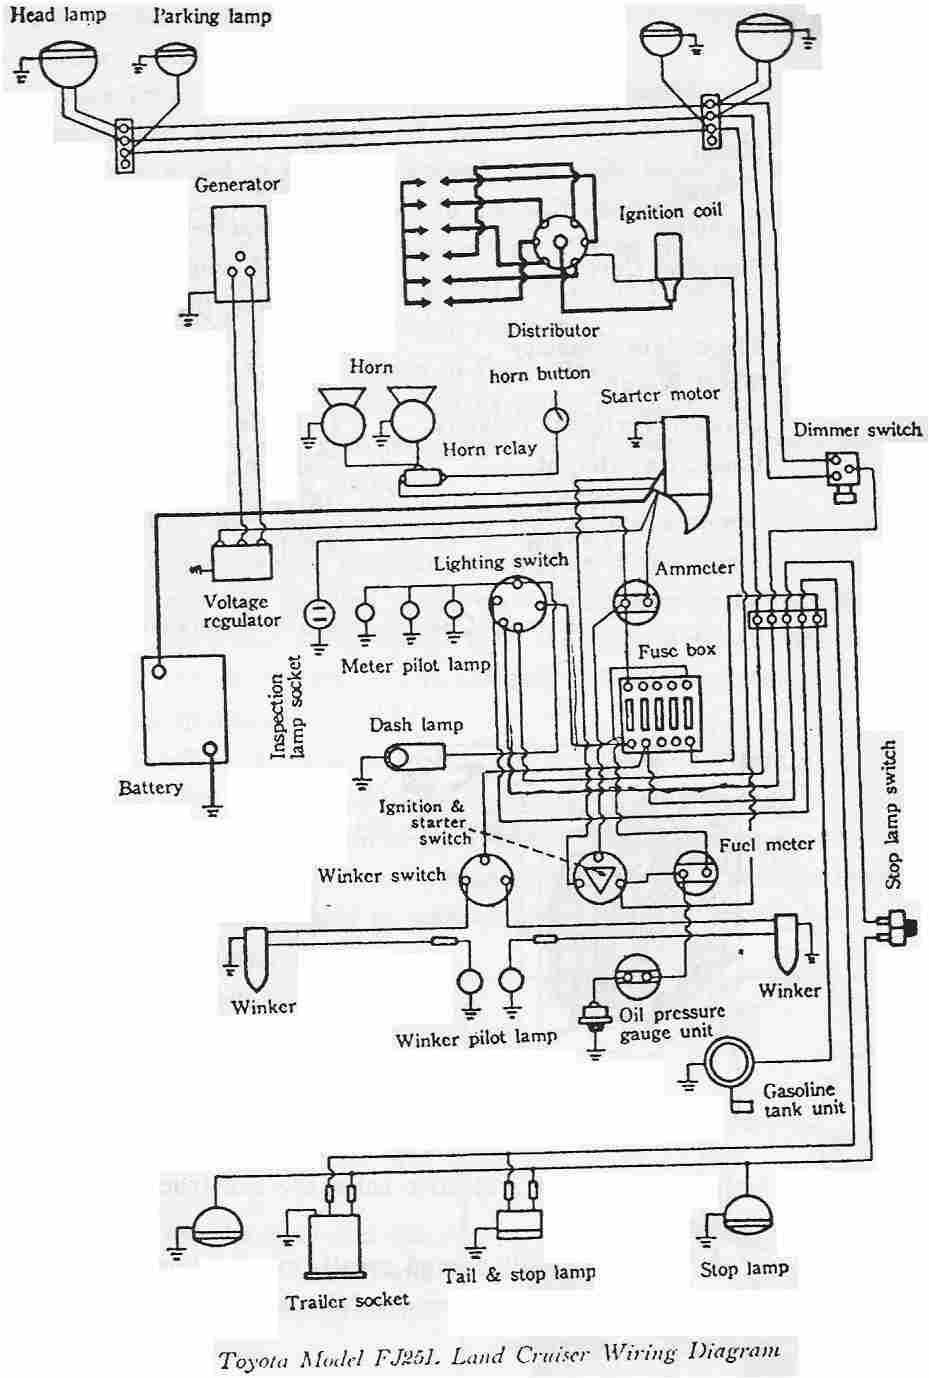 86120 Yy210 Wiring Diagram Toyota Basic Guide Wiring Diagram \u2022 Toyota  Stereo Pin Diagram Toyota 86120 0c020 Wiring Diagram